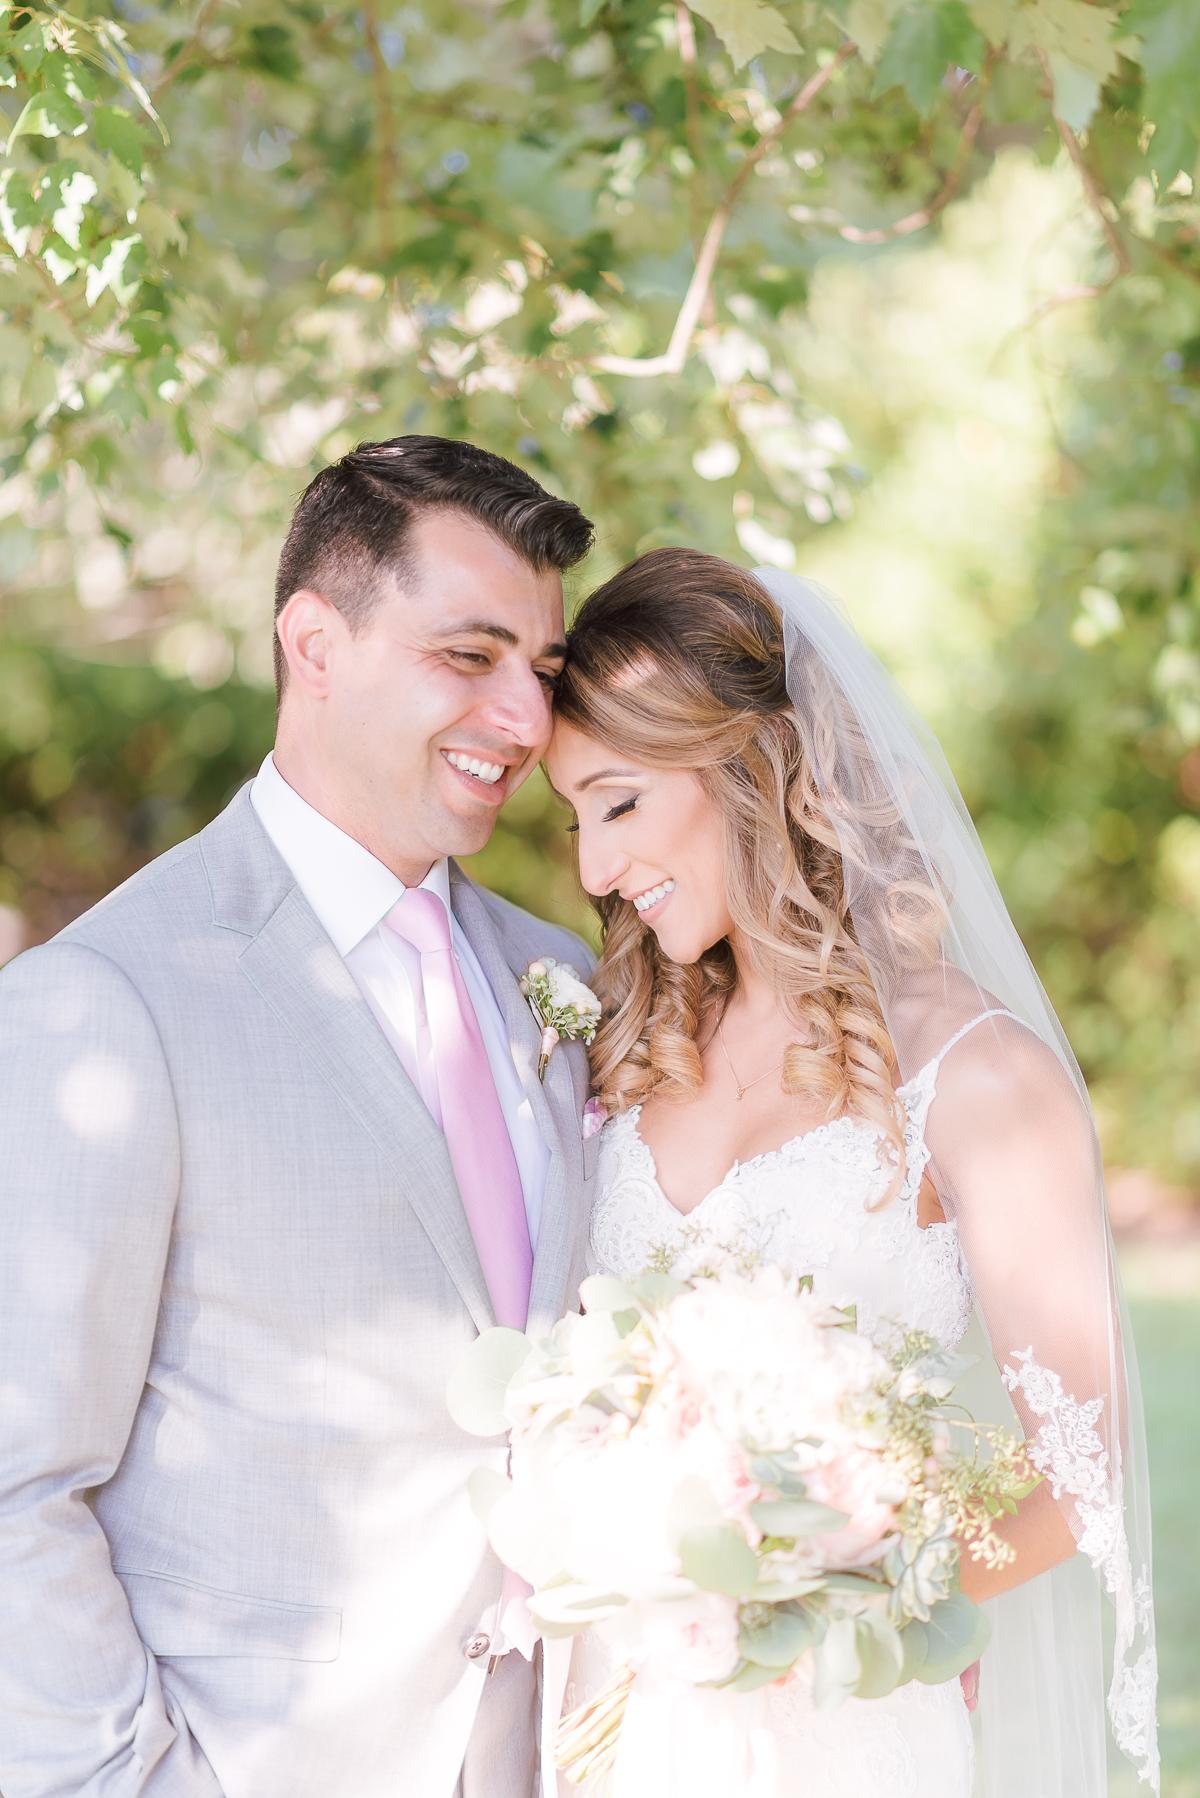 MD-Herrington-on-the-Bay-Wedding-Bridal-Portrait-37.jpg